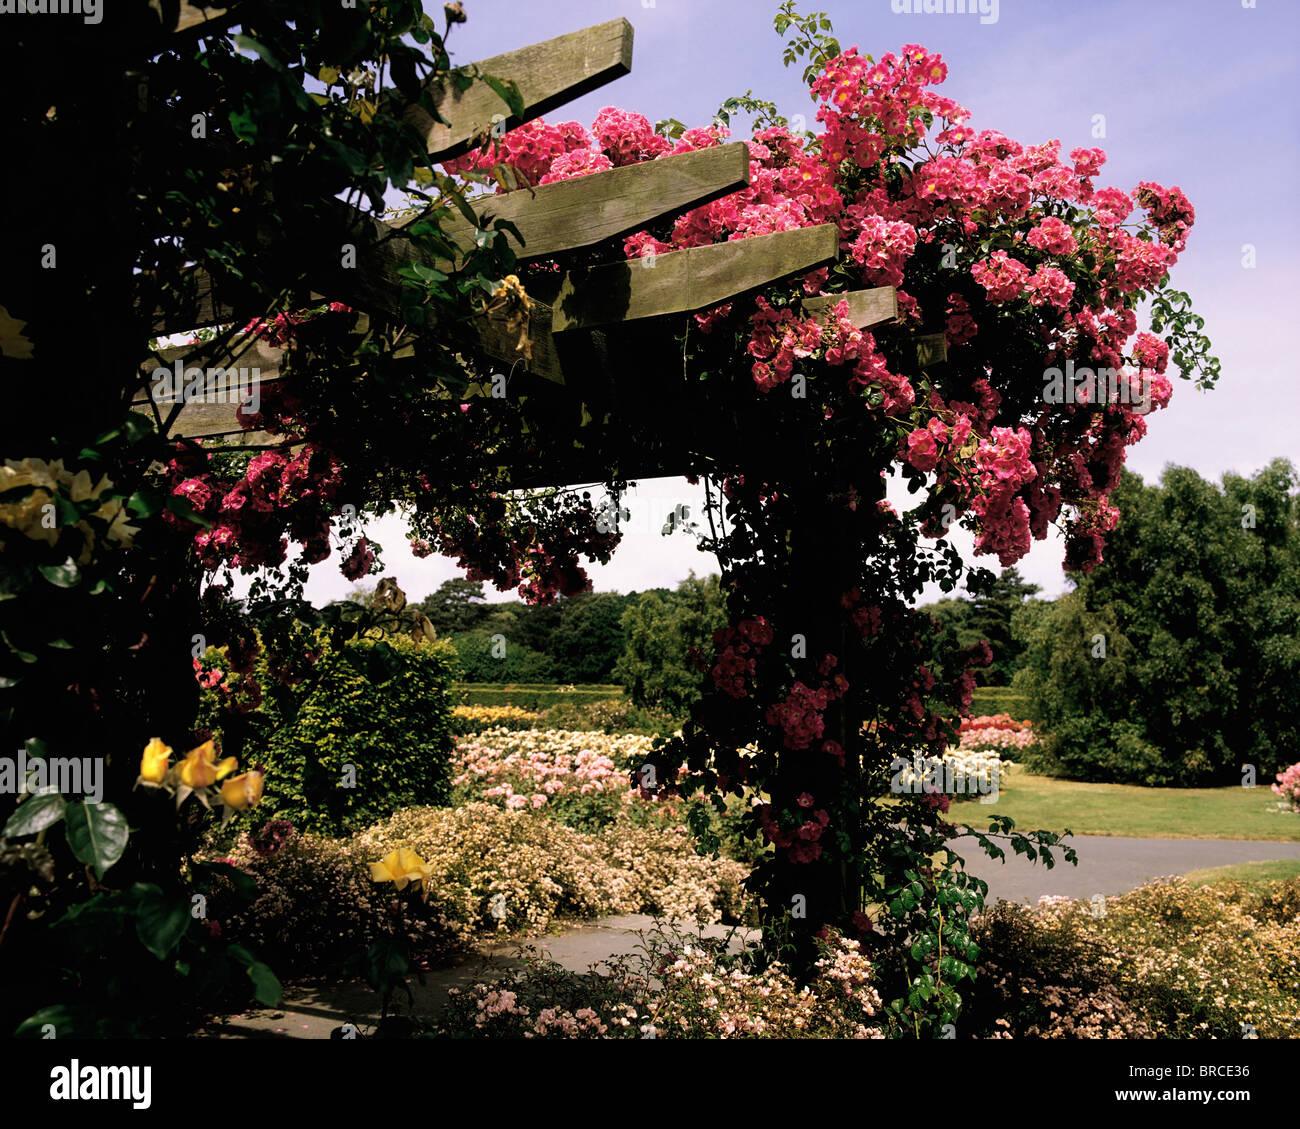 St Anne 39 S Park Rose Garden Clontarf Co Dublin Ireland Stockfoto Lizenzfreies Bild 31621946